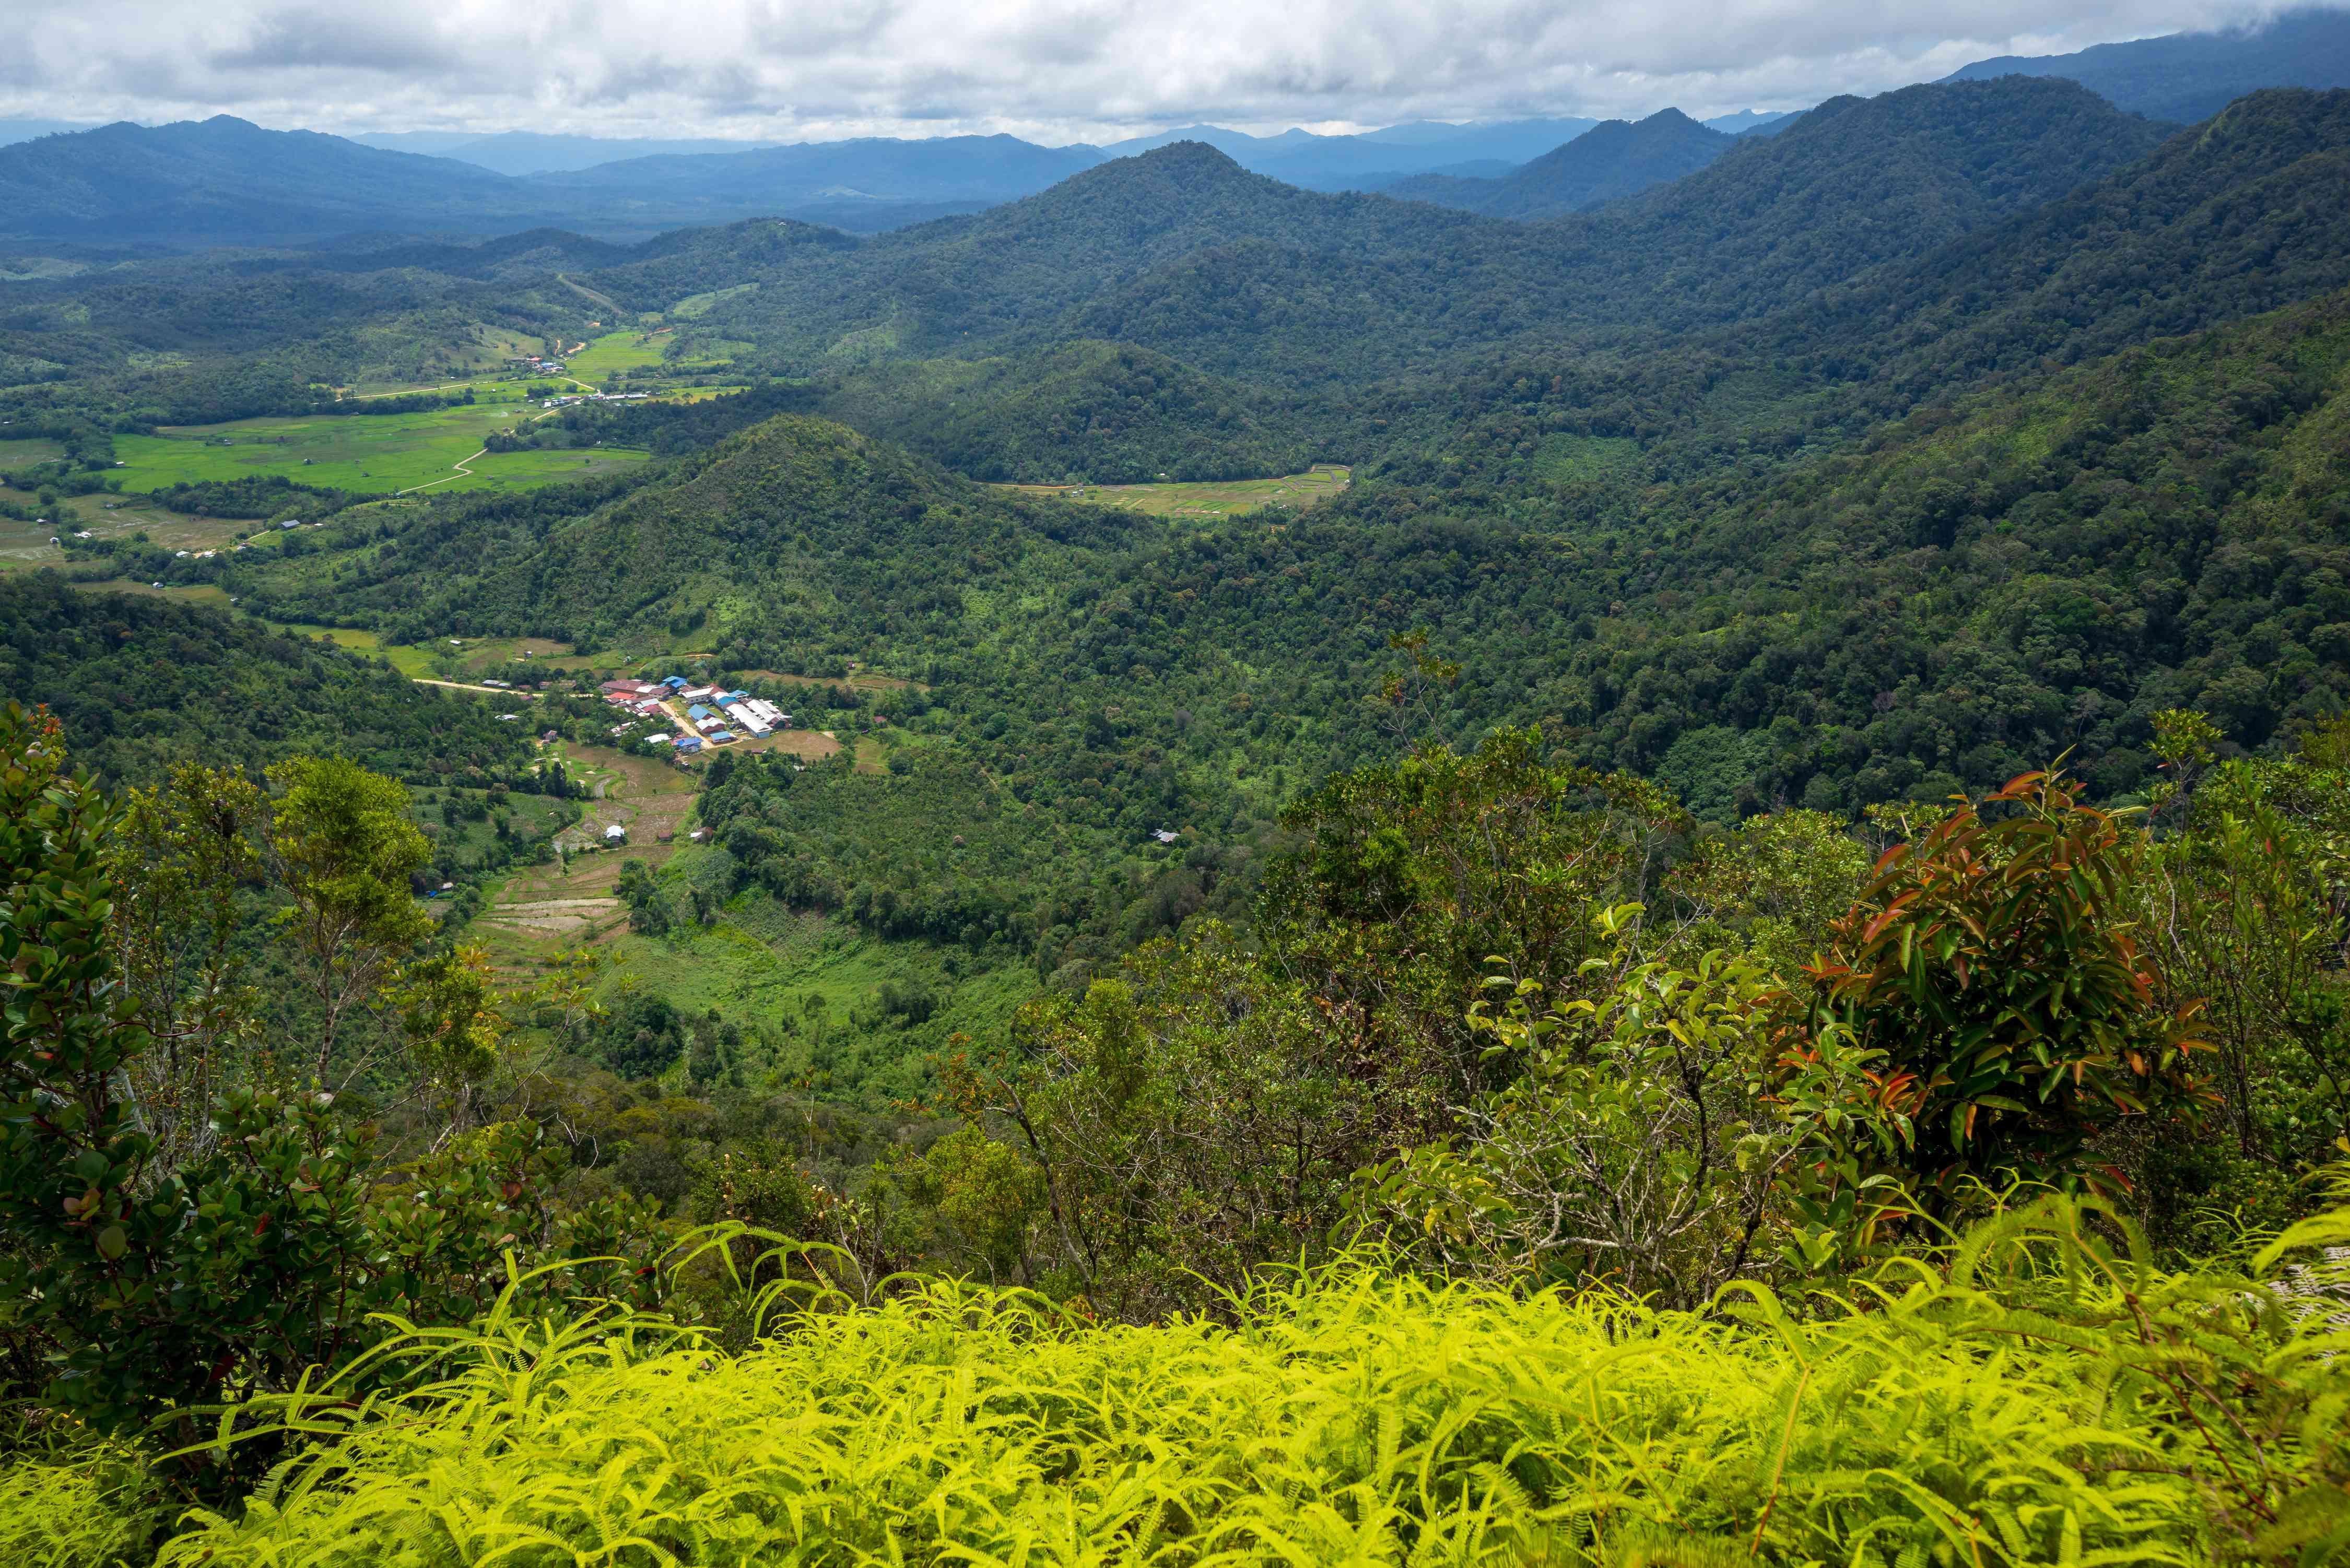 The green Bario Highlands in Borneo